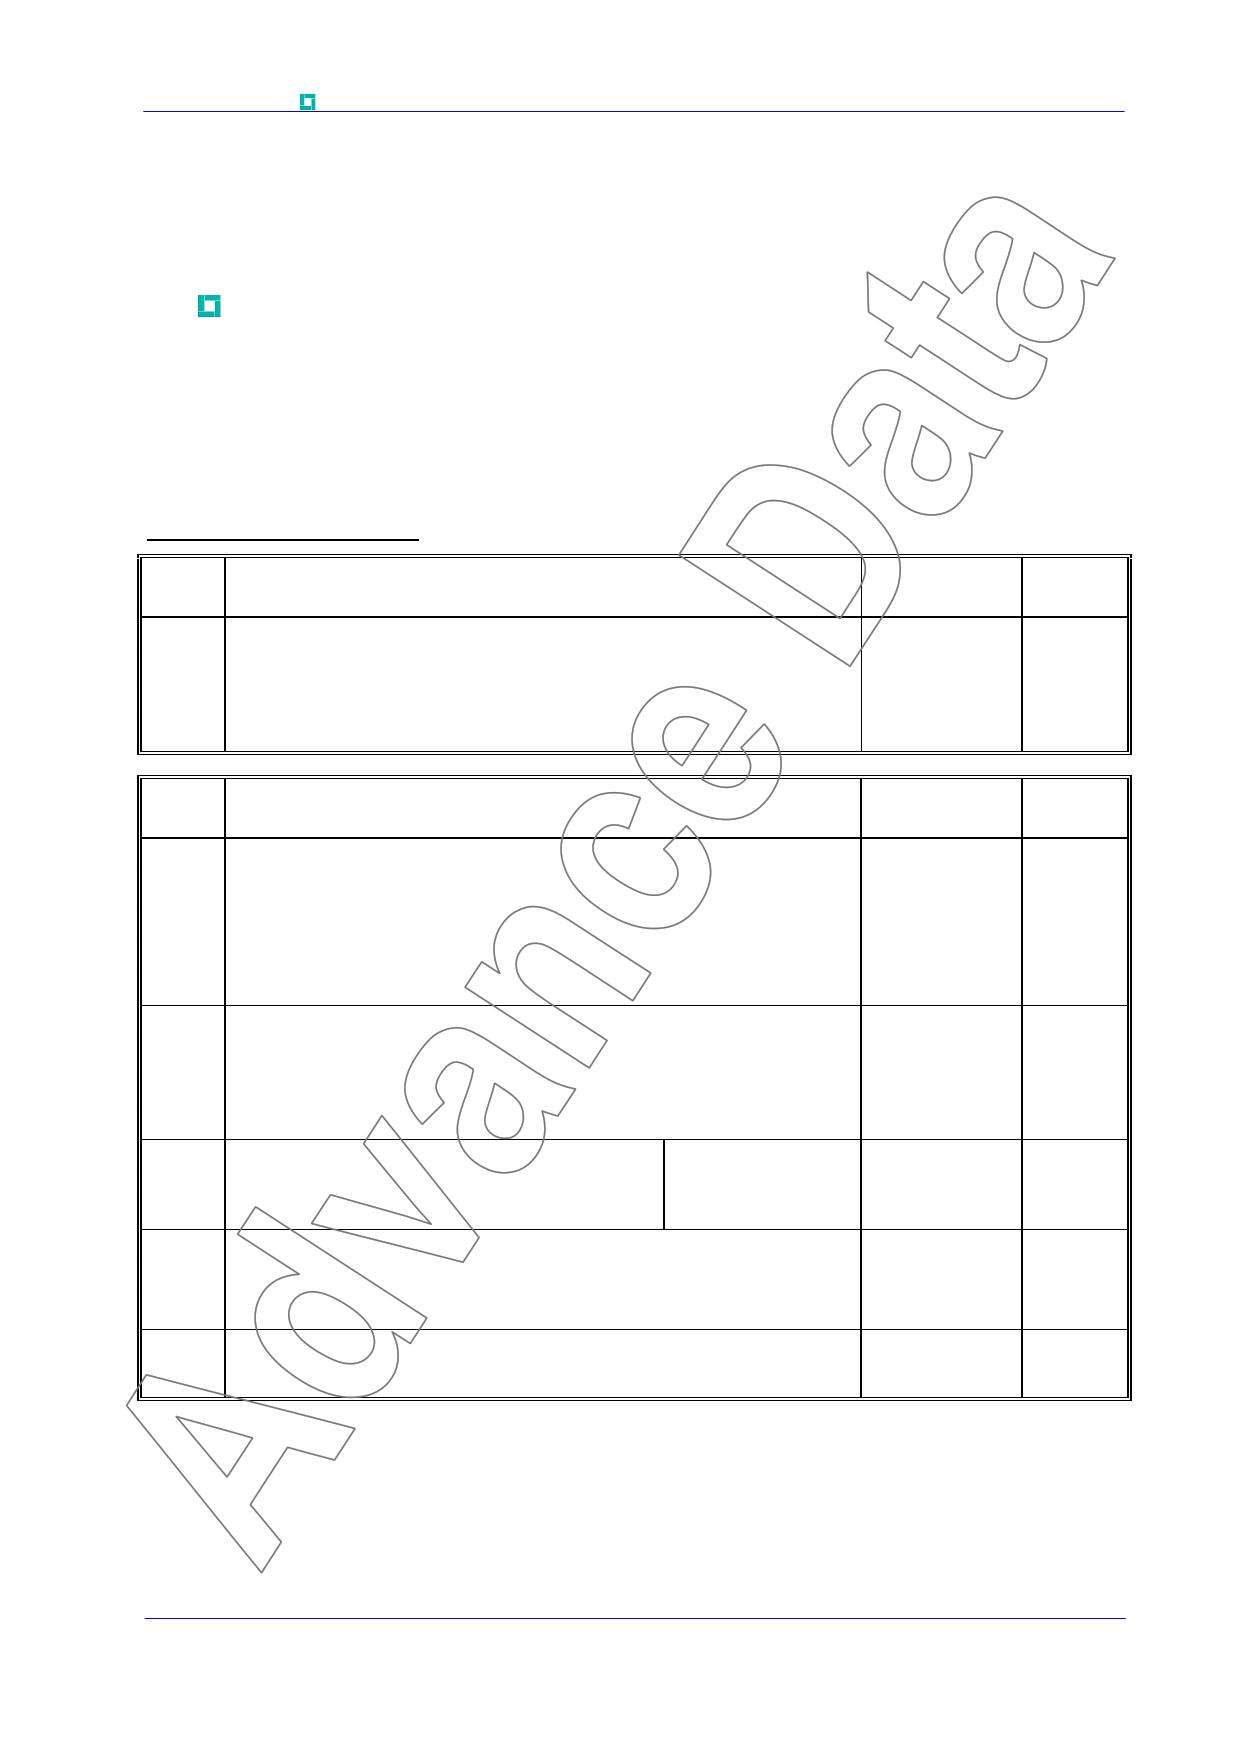 K0885NC520 datasheet